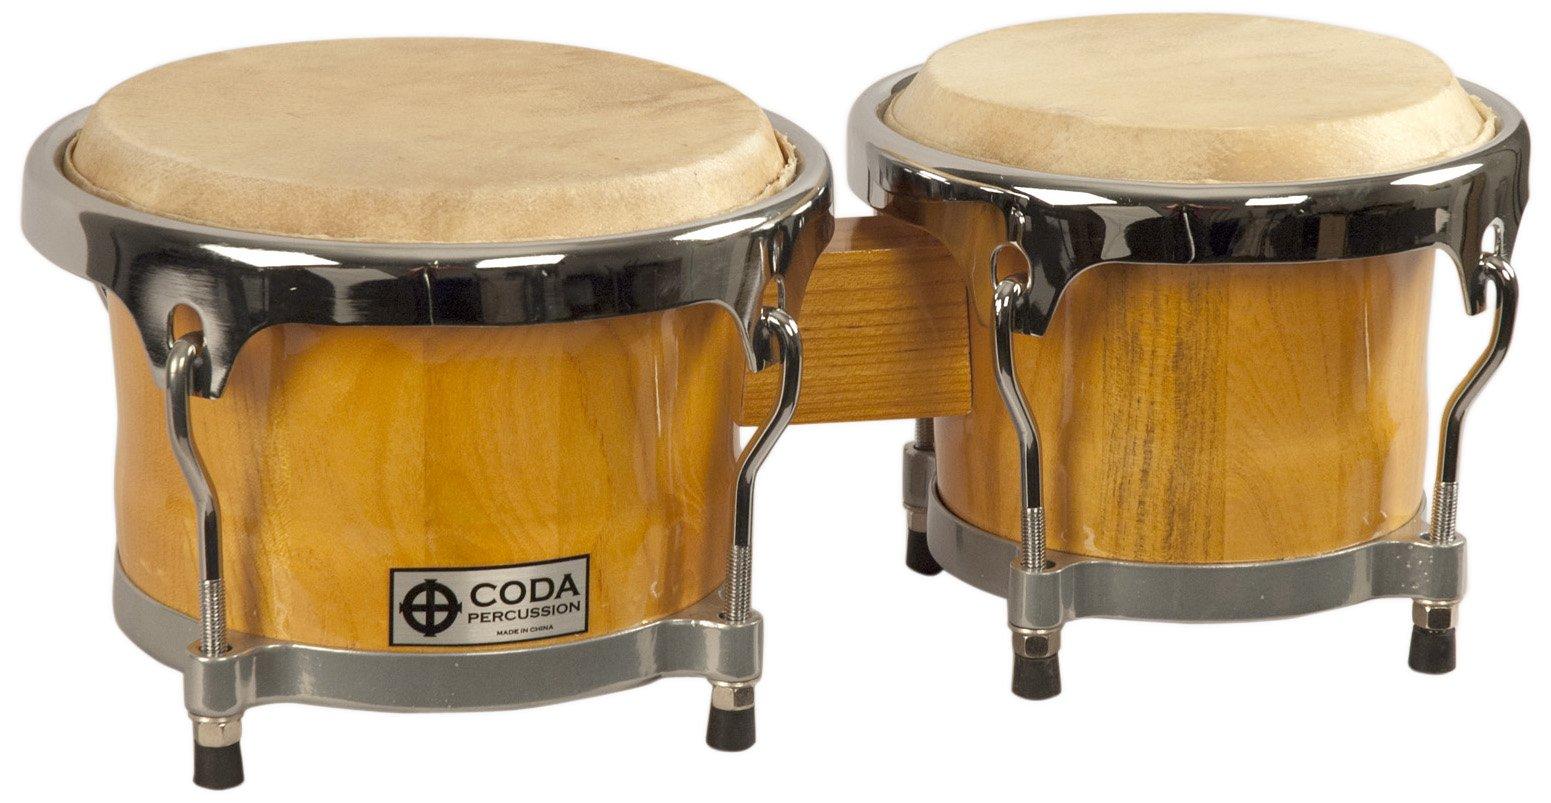 CODA DP-220 Bongo Drum, Natural